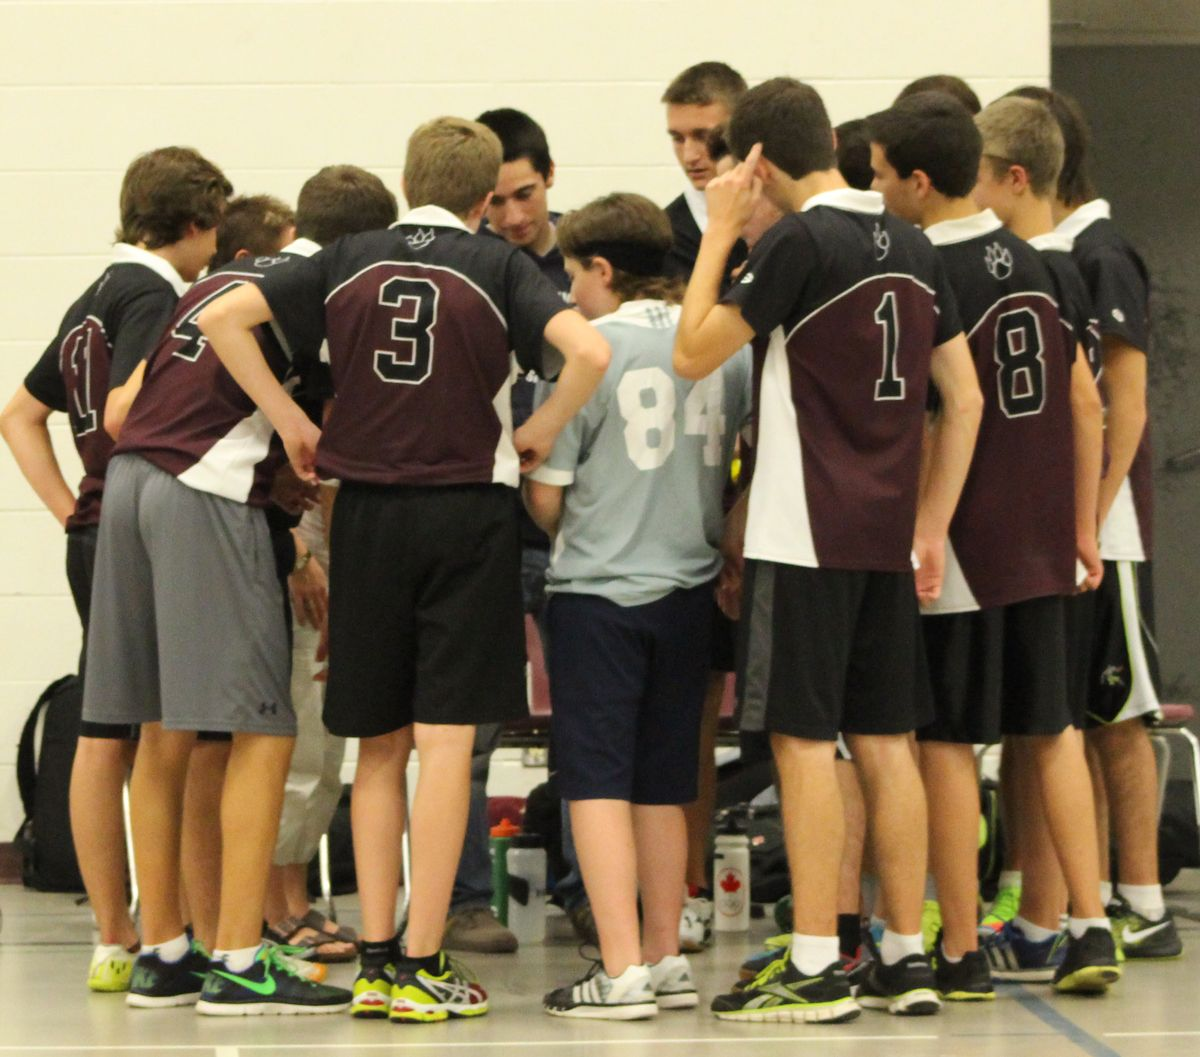 The Jb Boys Vollyball Team Are Having A Team Huddle Varsity Jacket Sports Sports Jersey